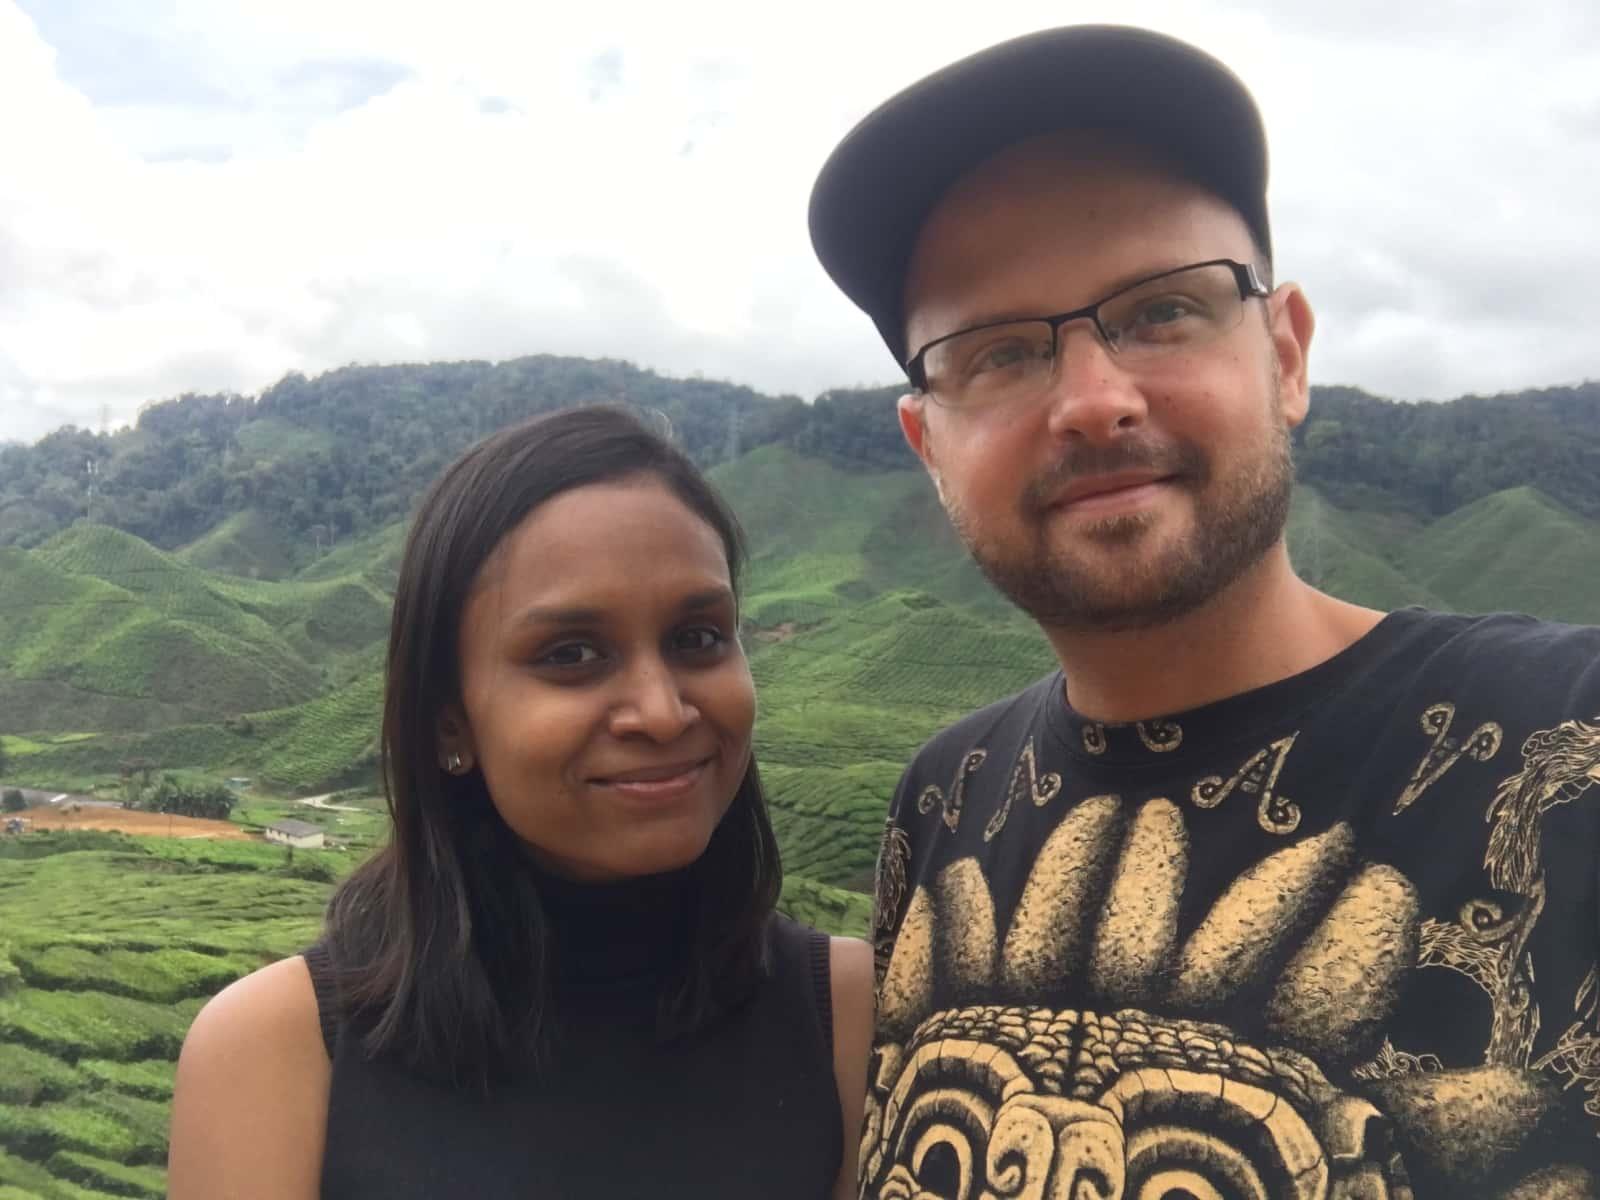 Elijah & Kartene from Kuala Lumpur, Malaysia